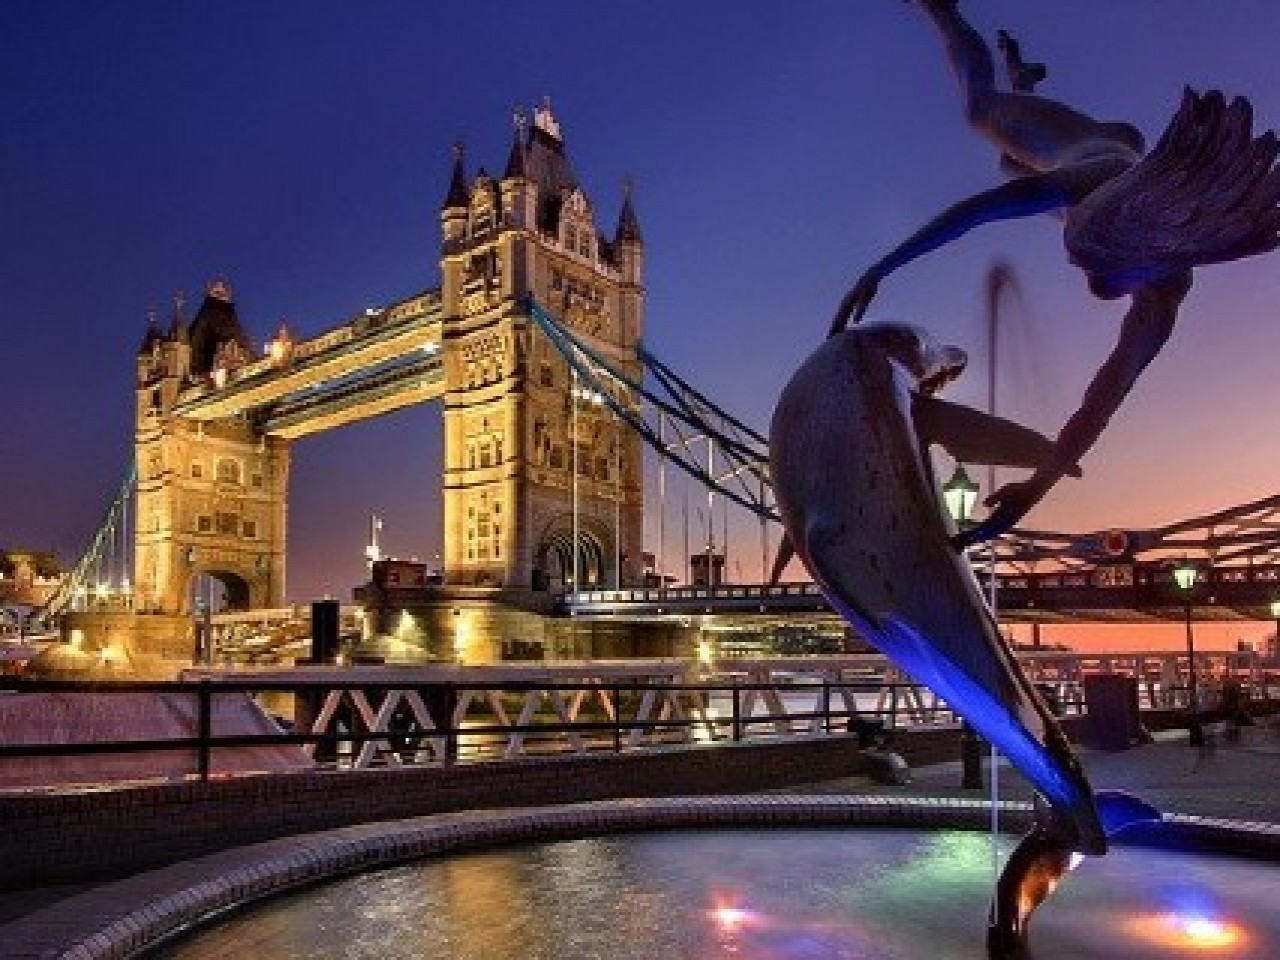 LONDRES +2370 HOTEL